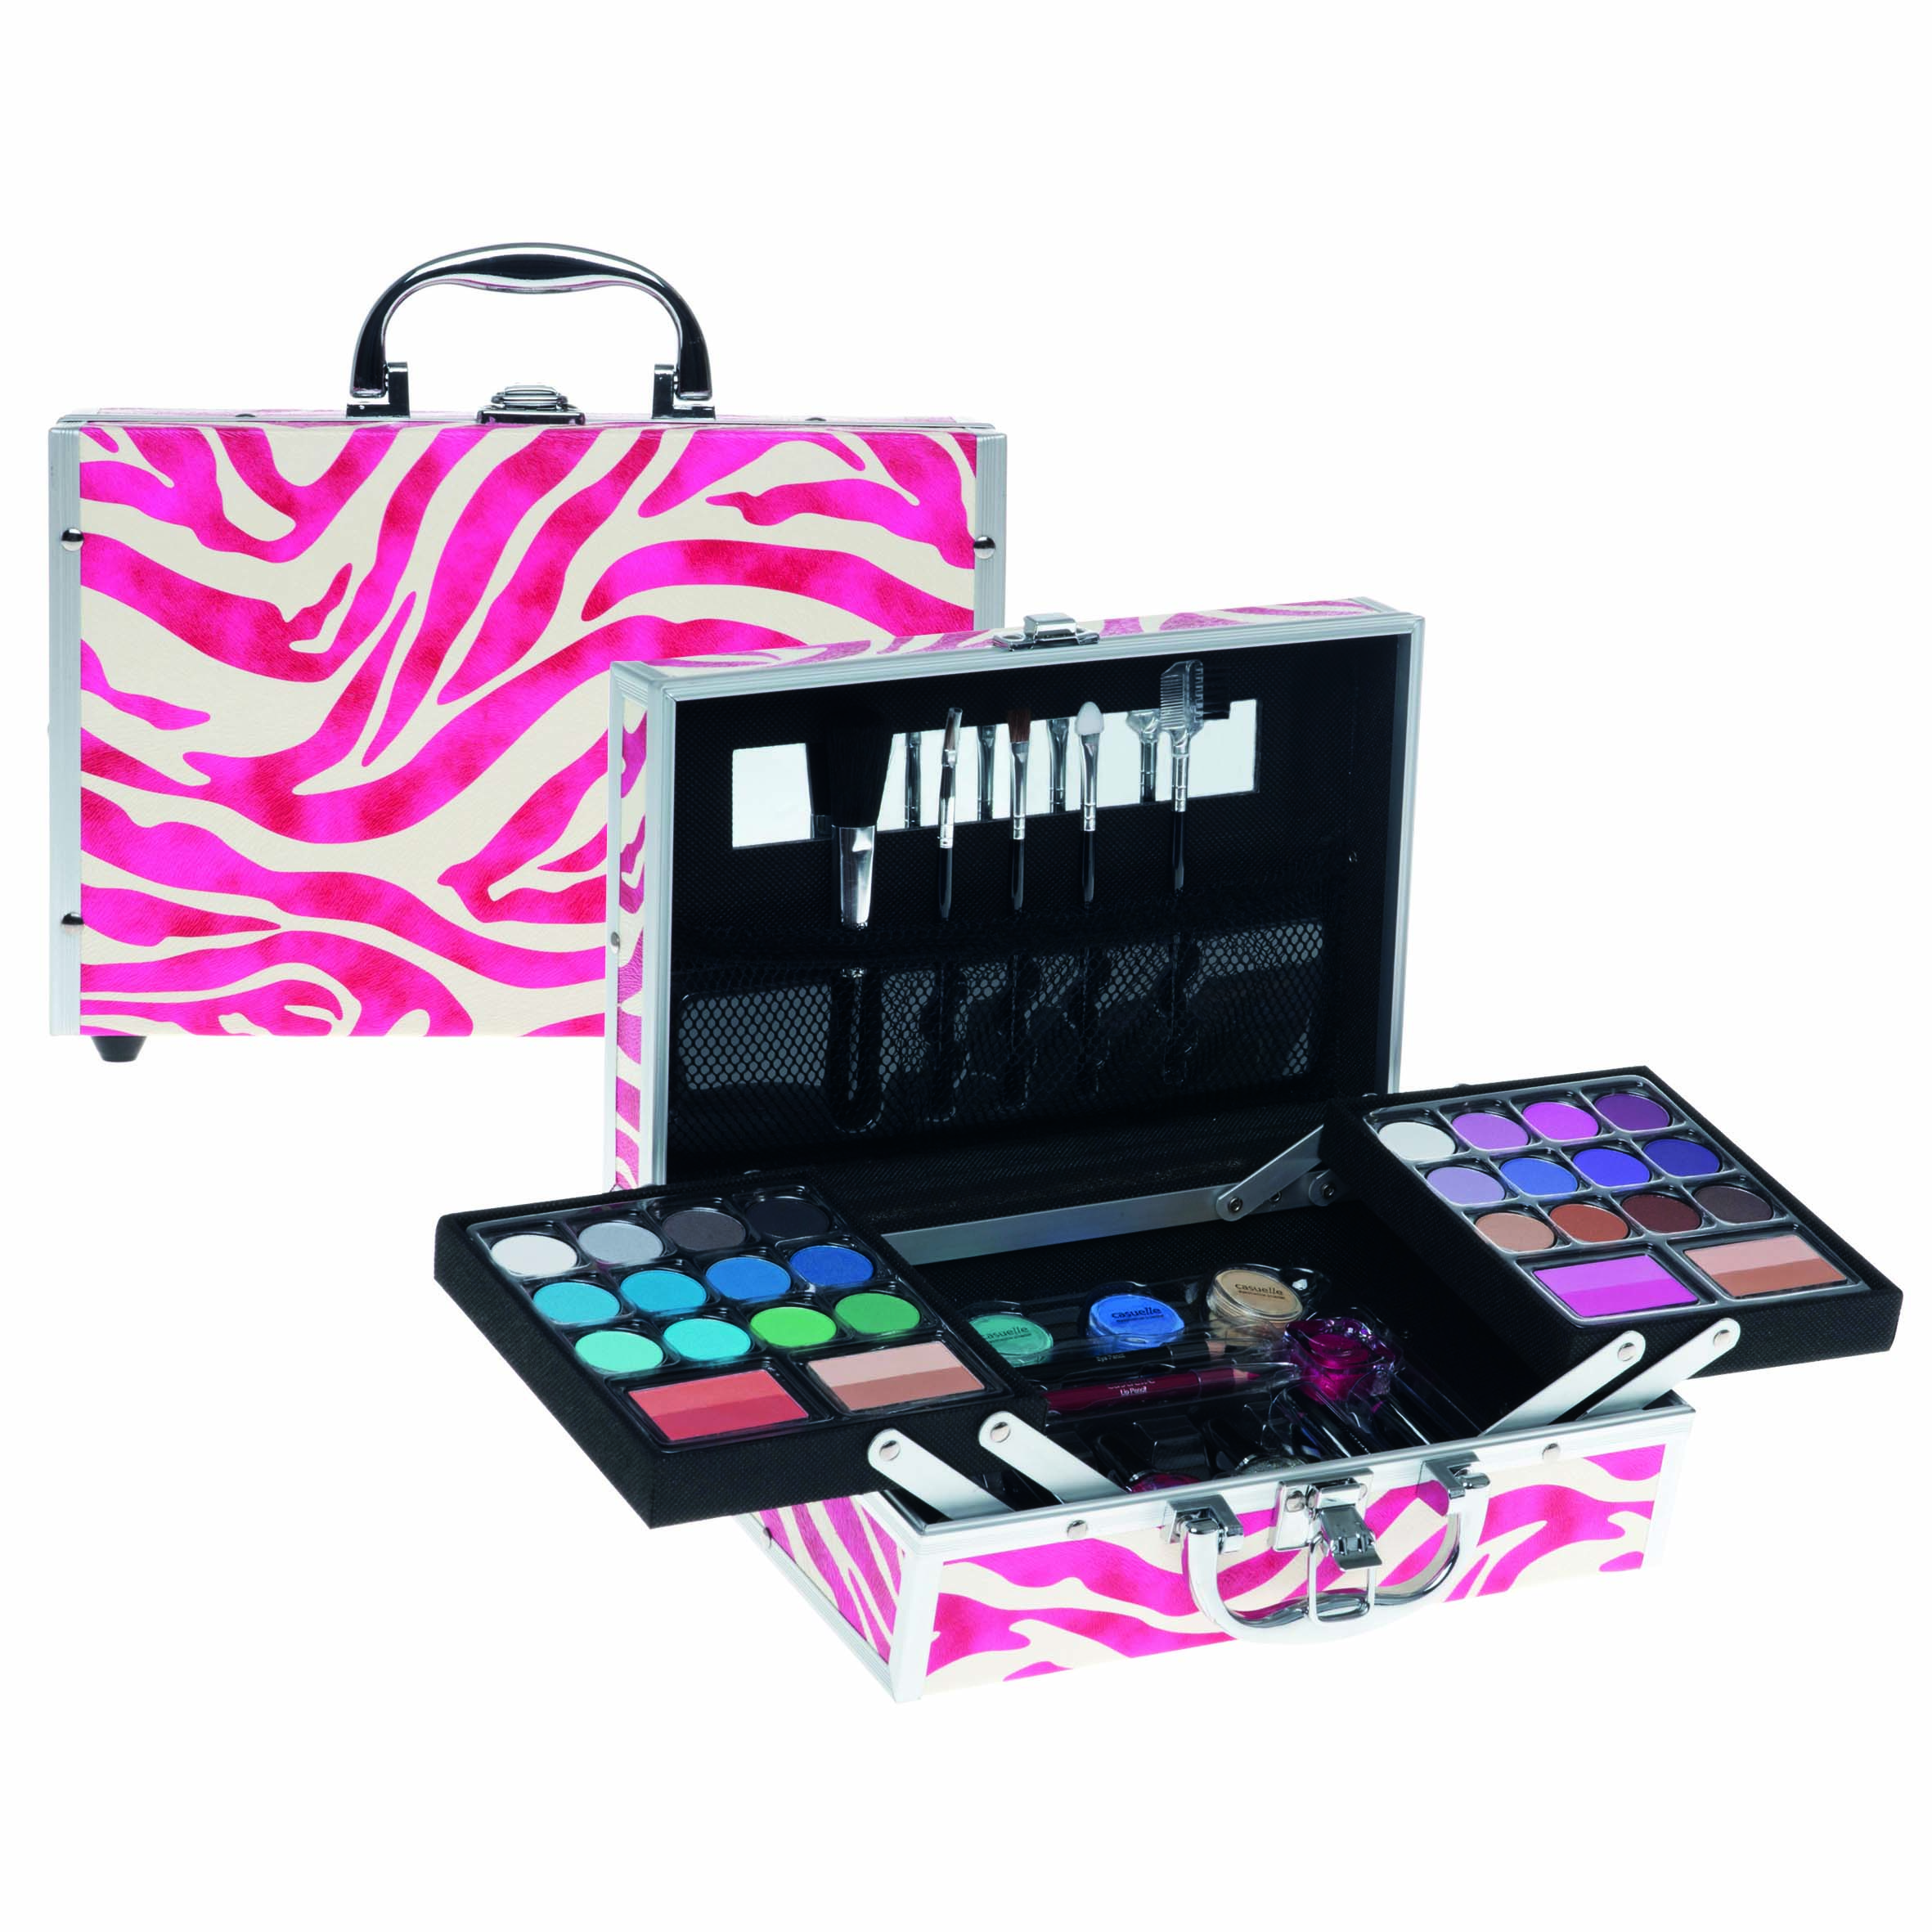 Afbeelding van Casuelle make-Up Koffer Zebraprint Roze En Wit